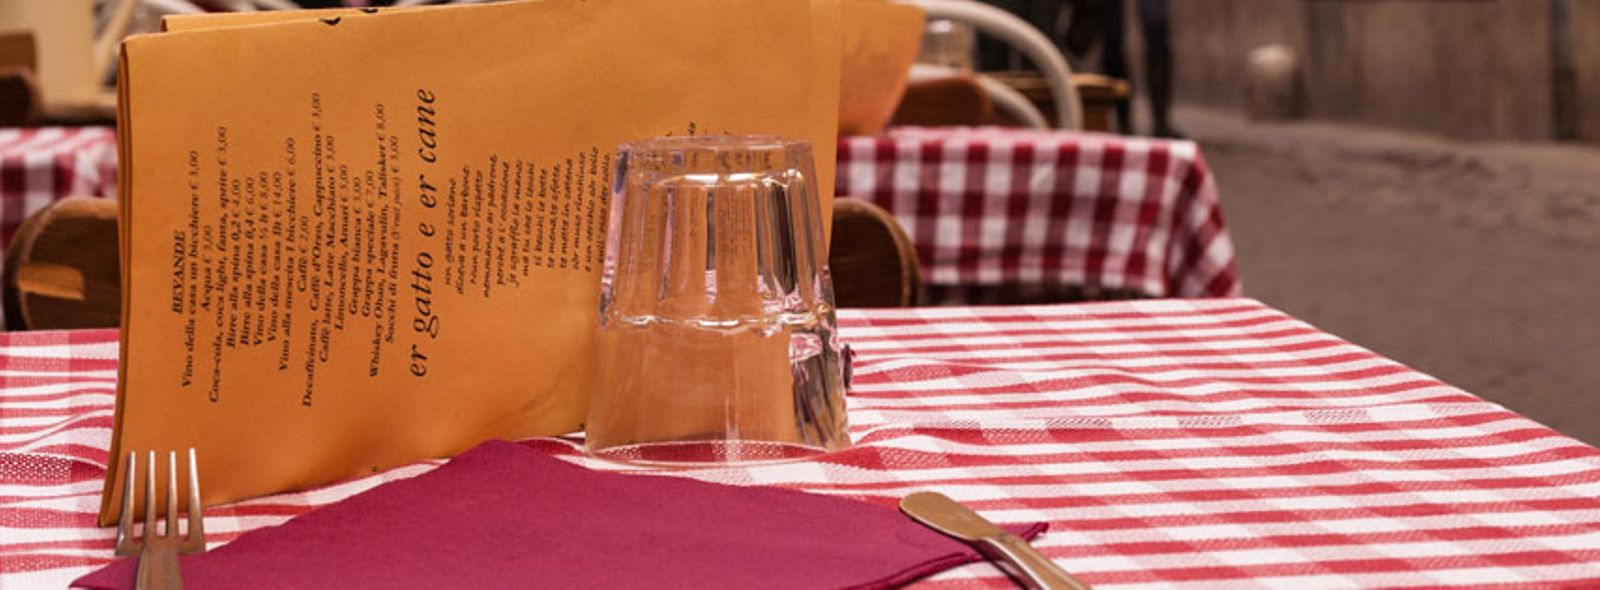 Bologna: mangiare bene spendendo poco